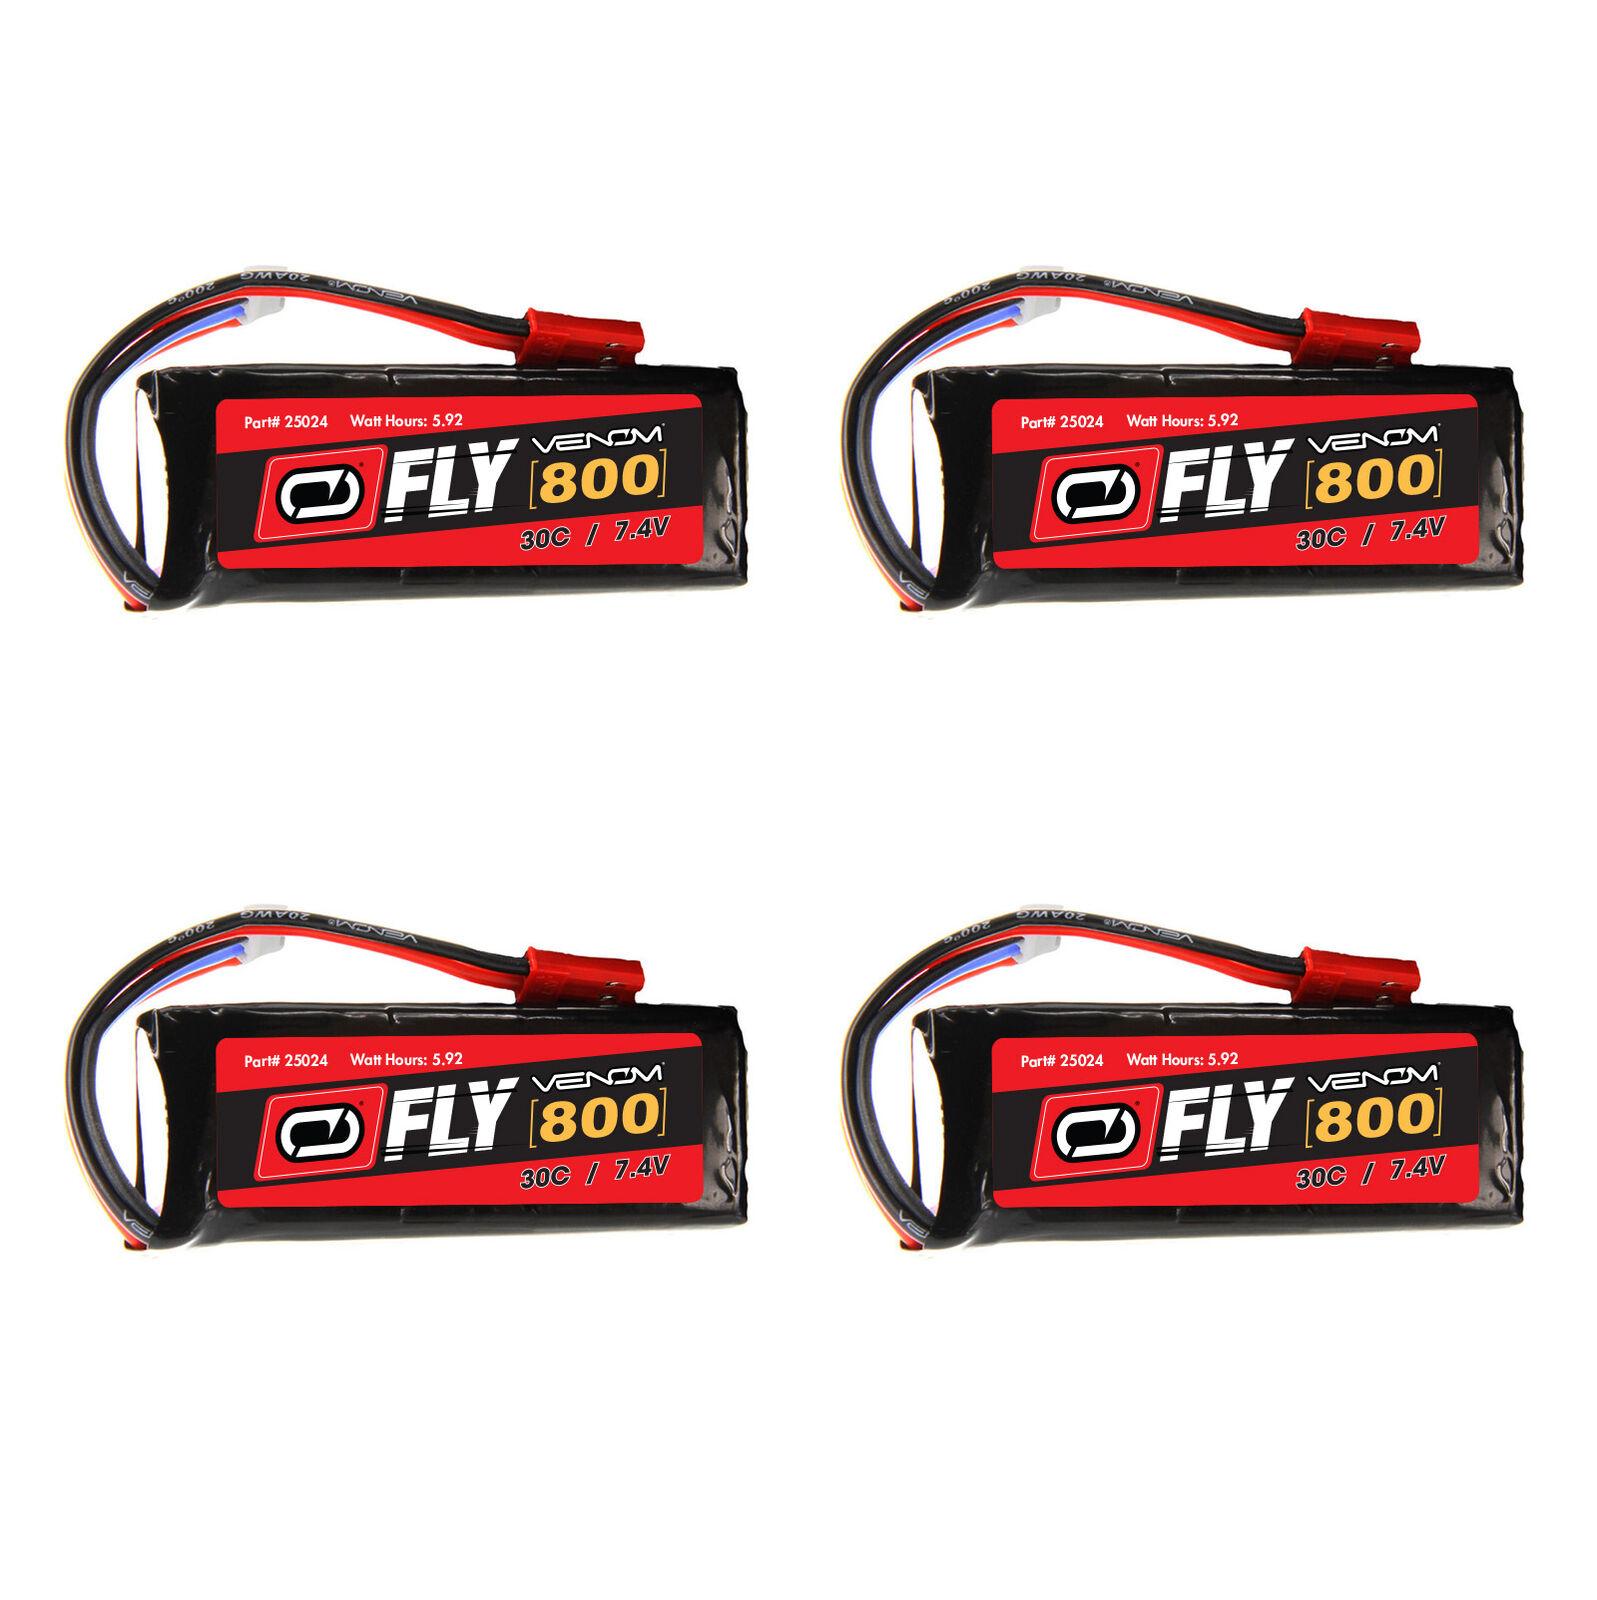 Venom volar 30C 2S 800mAh 7.4V batería LiPo con paquetes de Enchufe x4 JST